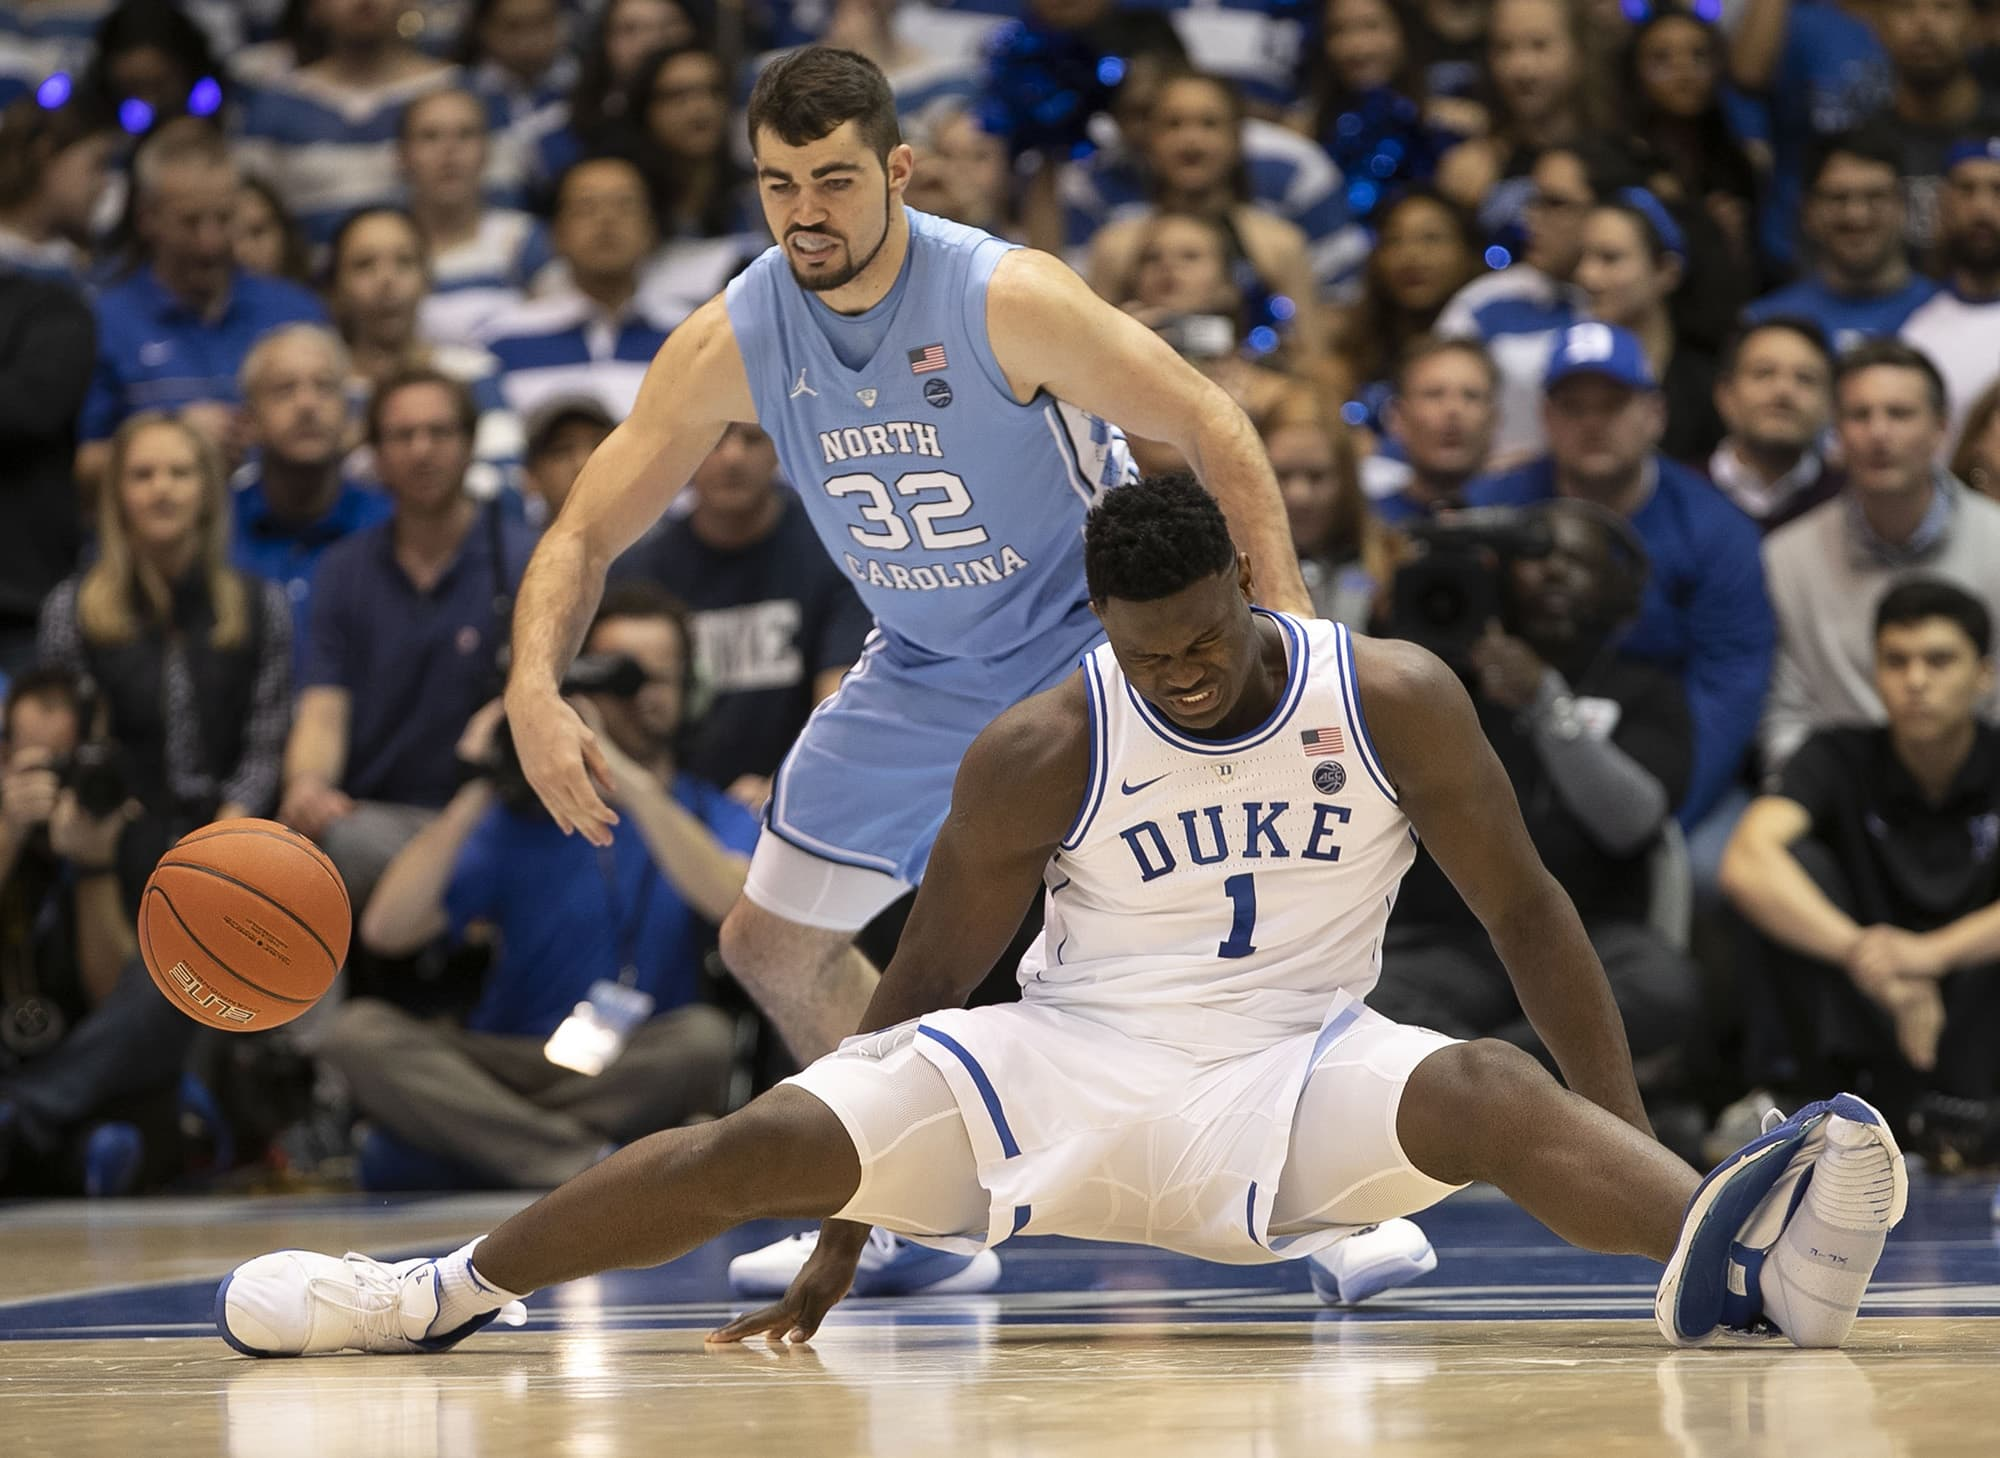 97e59841ac4 Duke player Zion Williamson injured when Nike shoe blows apart during game